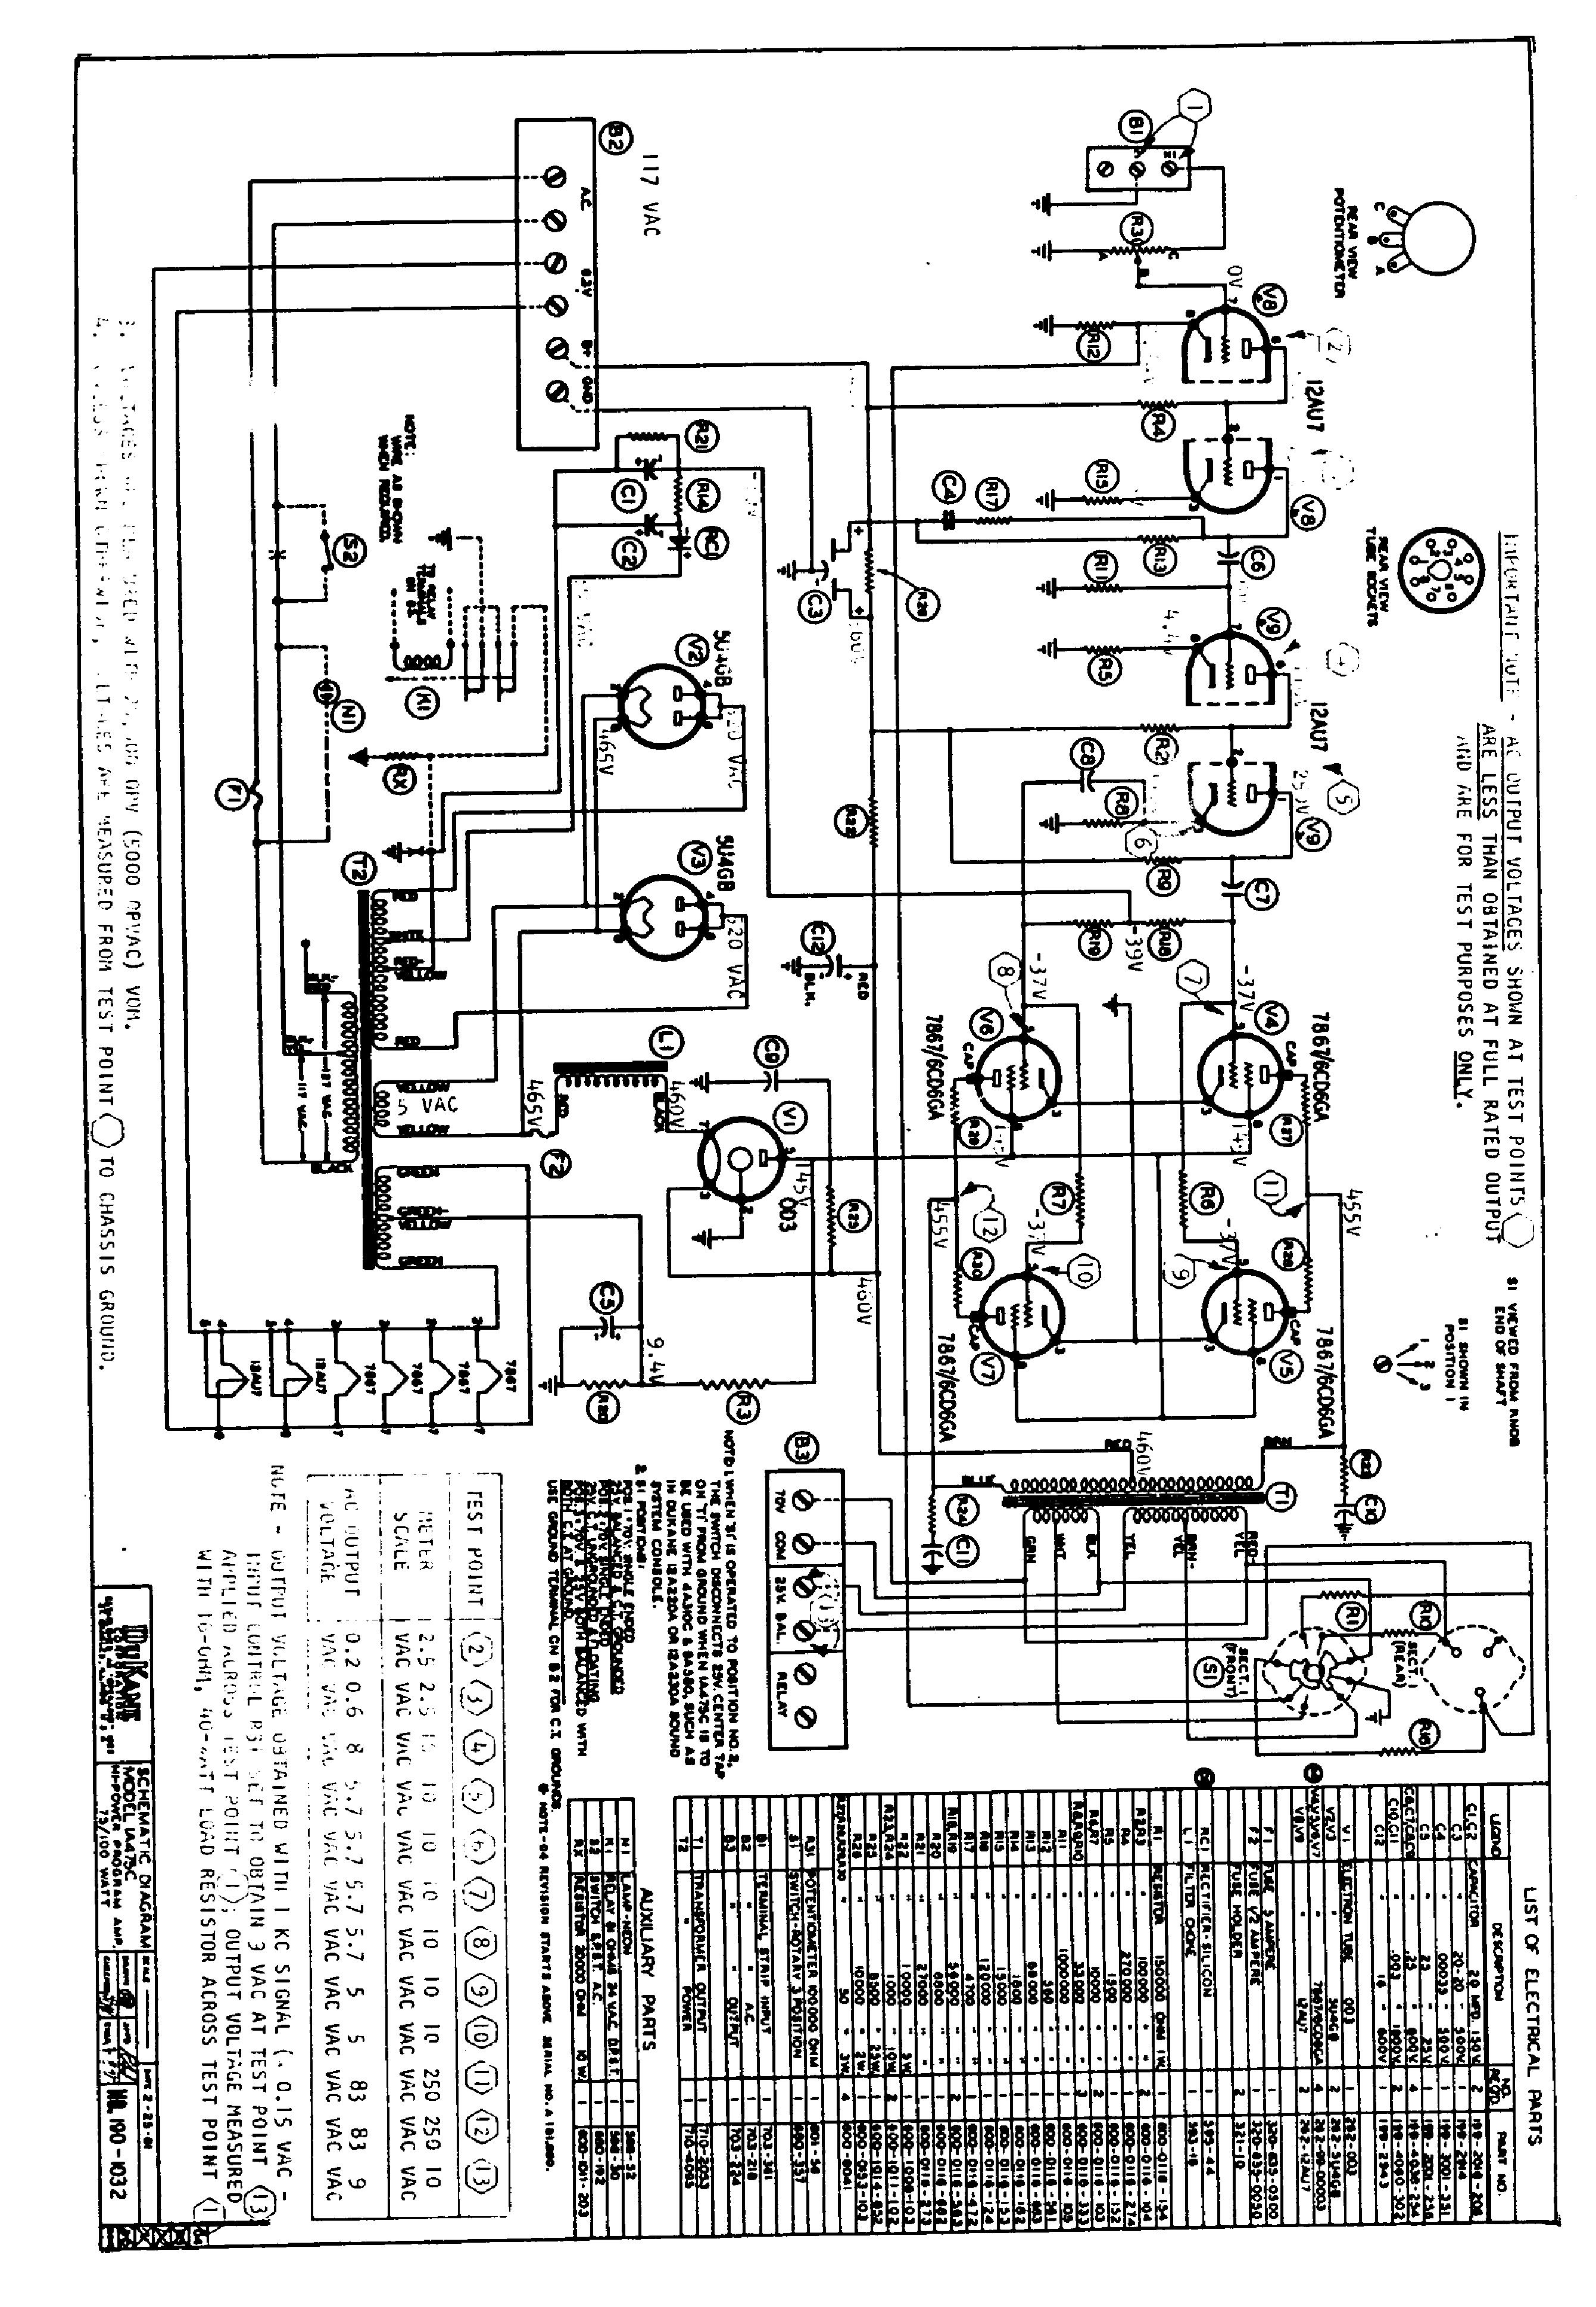 dukane 1a475 sch service manual download, schematics, eeprom, repairdukane 1a475 sch service manual (1st page)